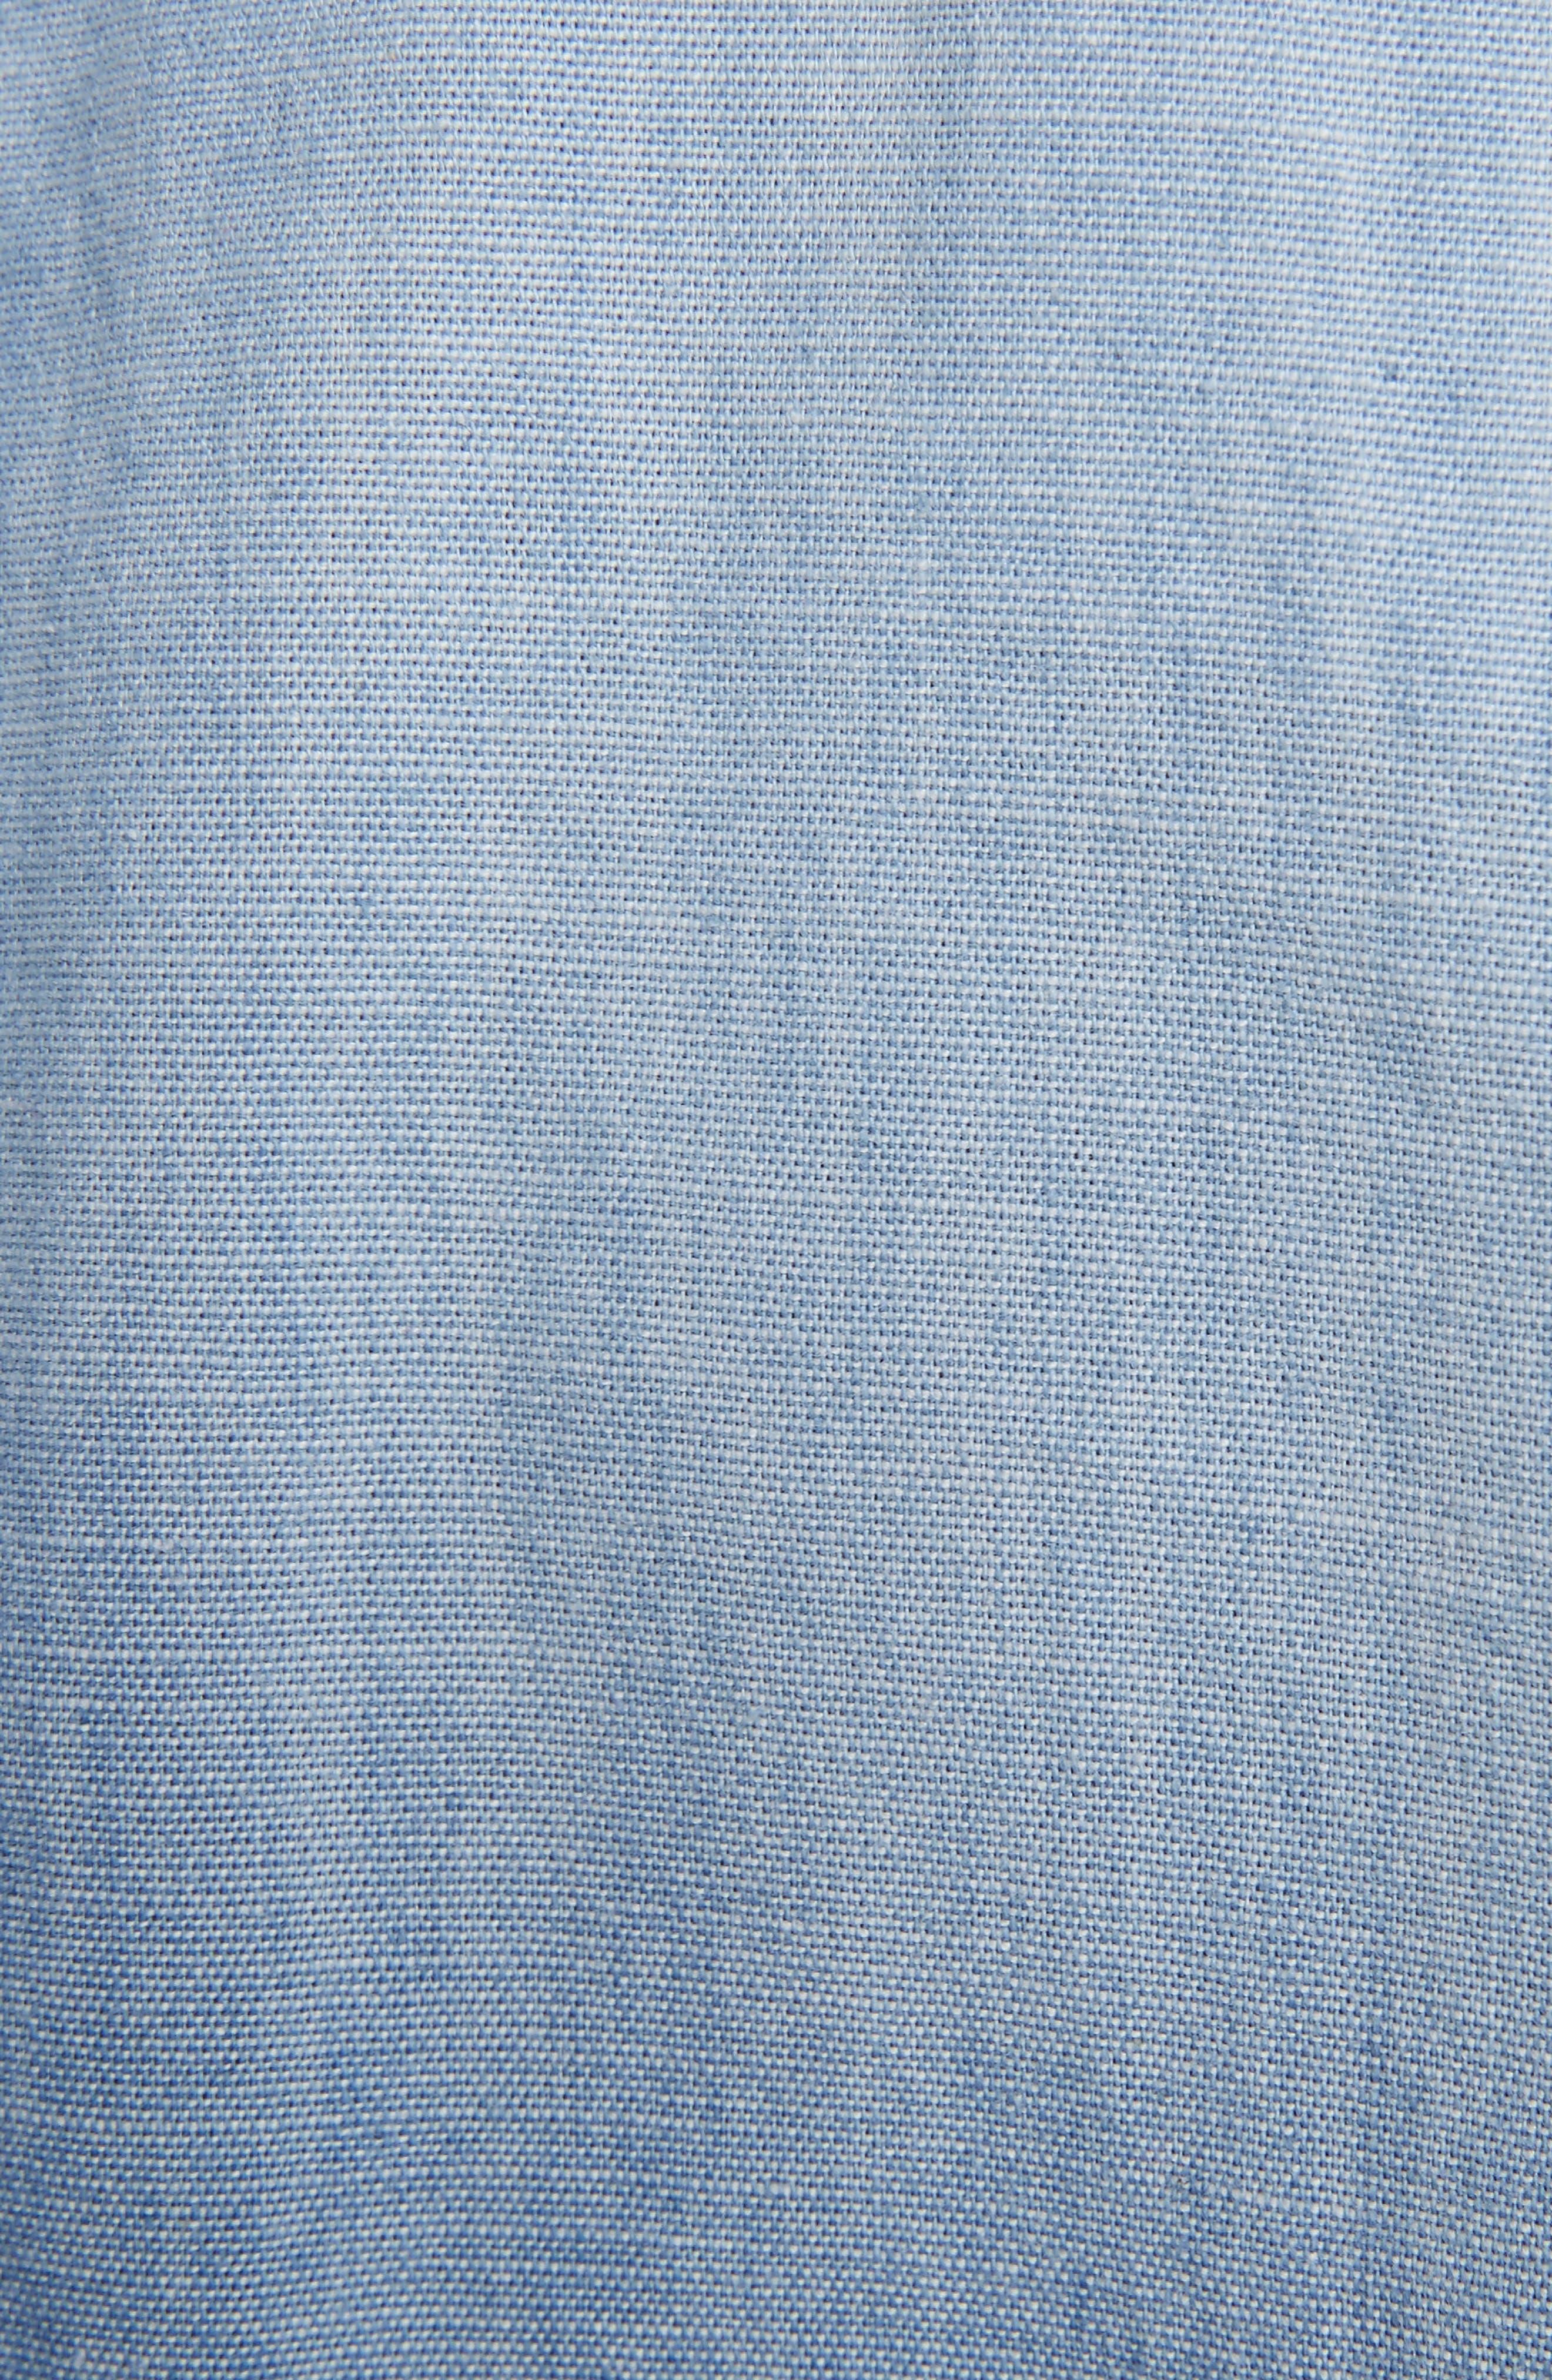 Isabel Marant Étoile Lelicia Denim Ruffle Dress,                             Alternate thumbnail 6, color,                             400